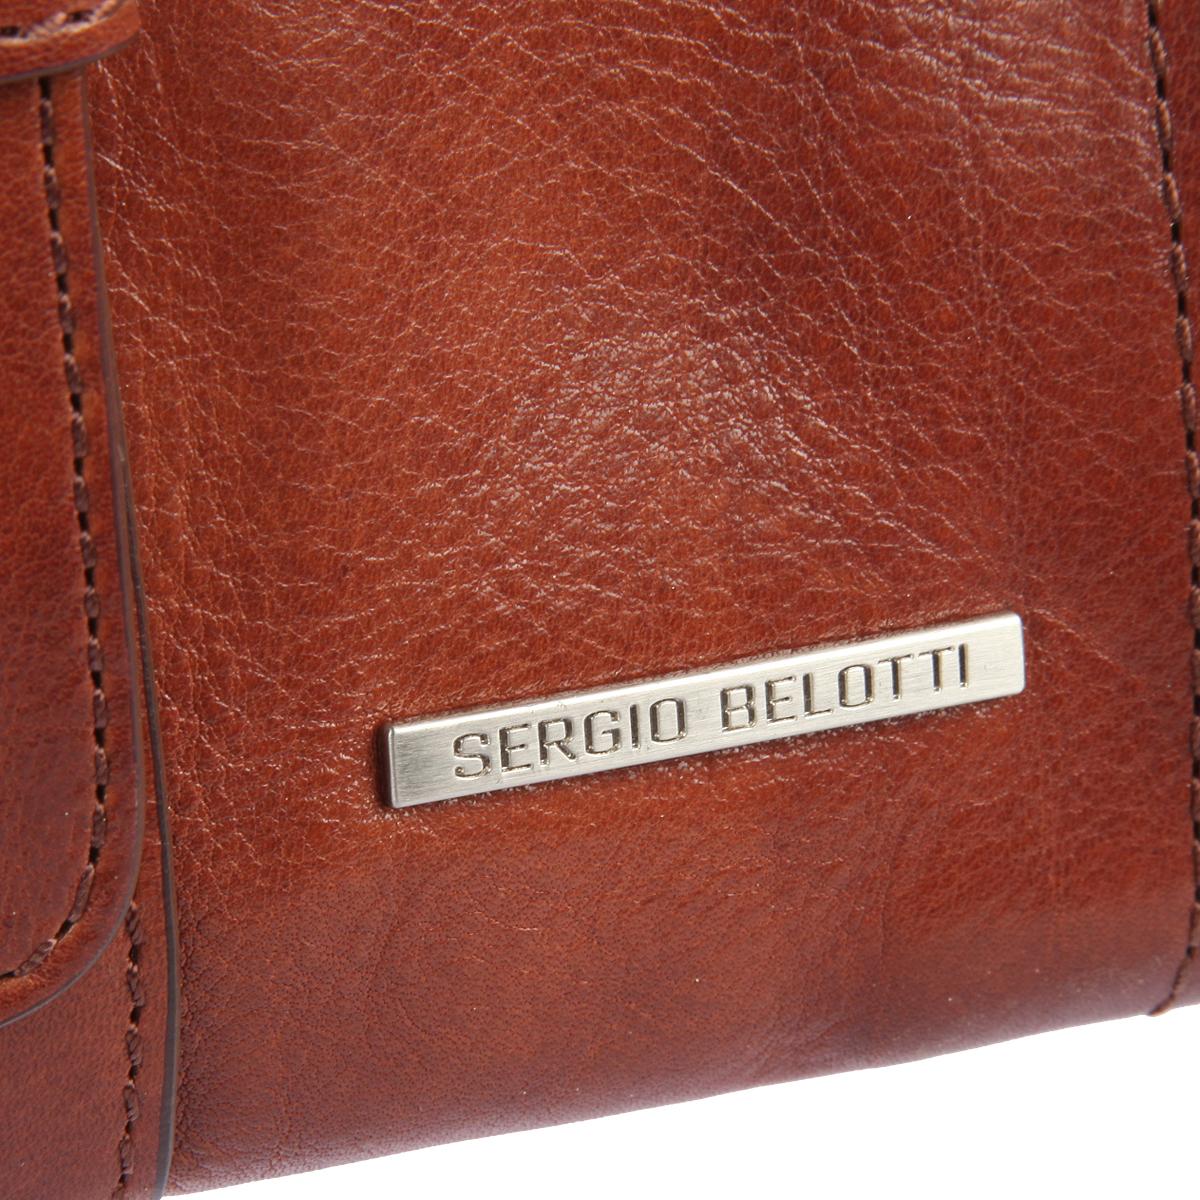 Планшет мужской Sergio Belotti, цвет: коричневый. 9279 oro brown